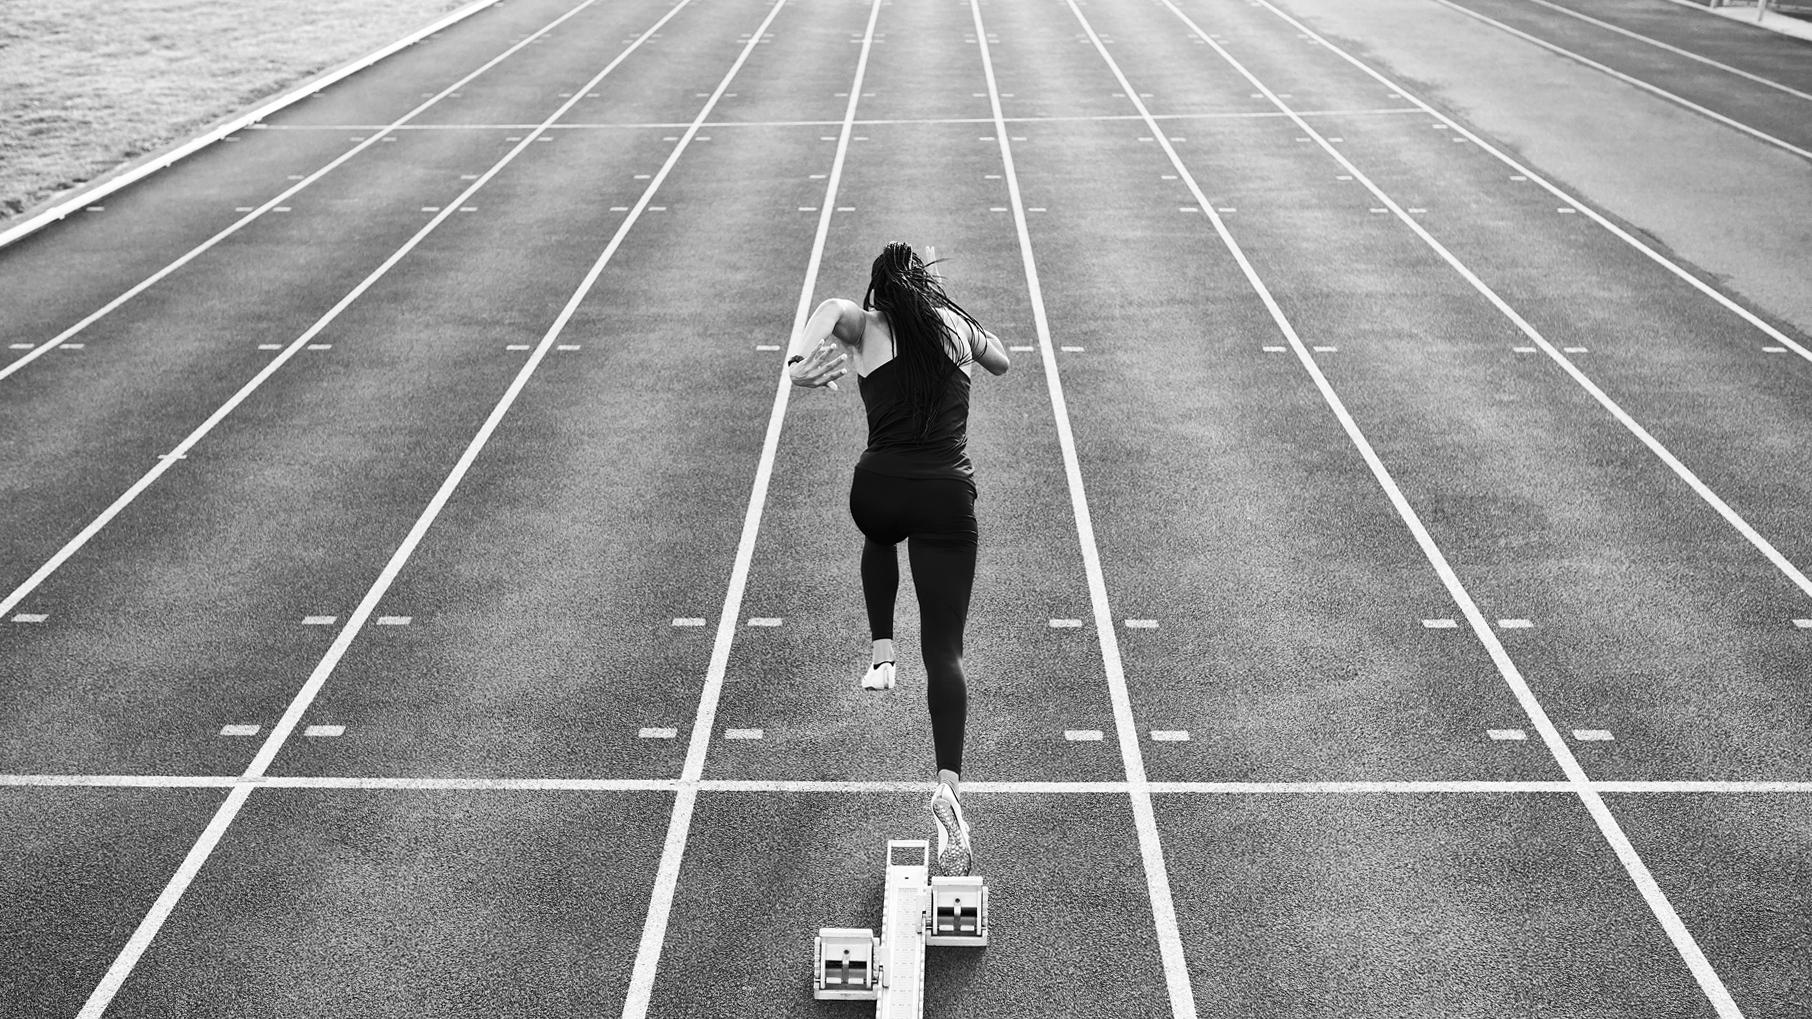 SD_Venture3_Day_2_Track-Runner_4609-16×9-version